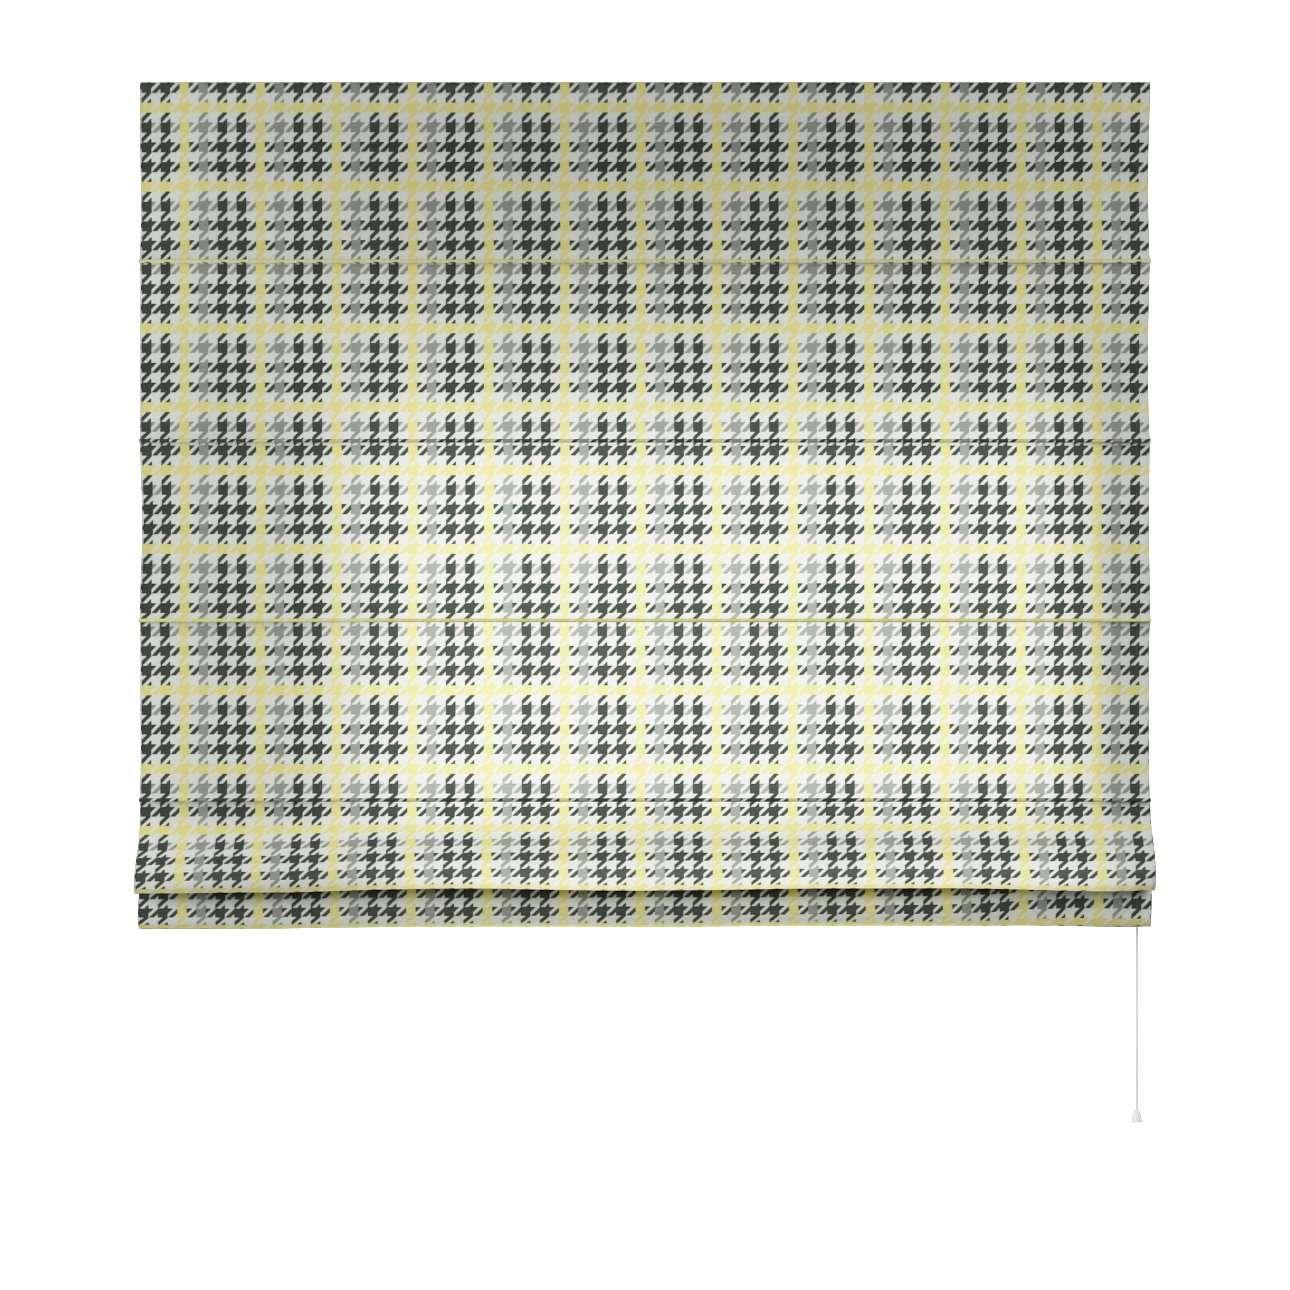 Romanetės Capri 80 x 170 cm (plotis x ilgis) kolekcijoje Brooklyn, audinys: 137-79